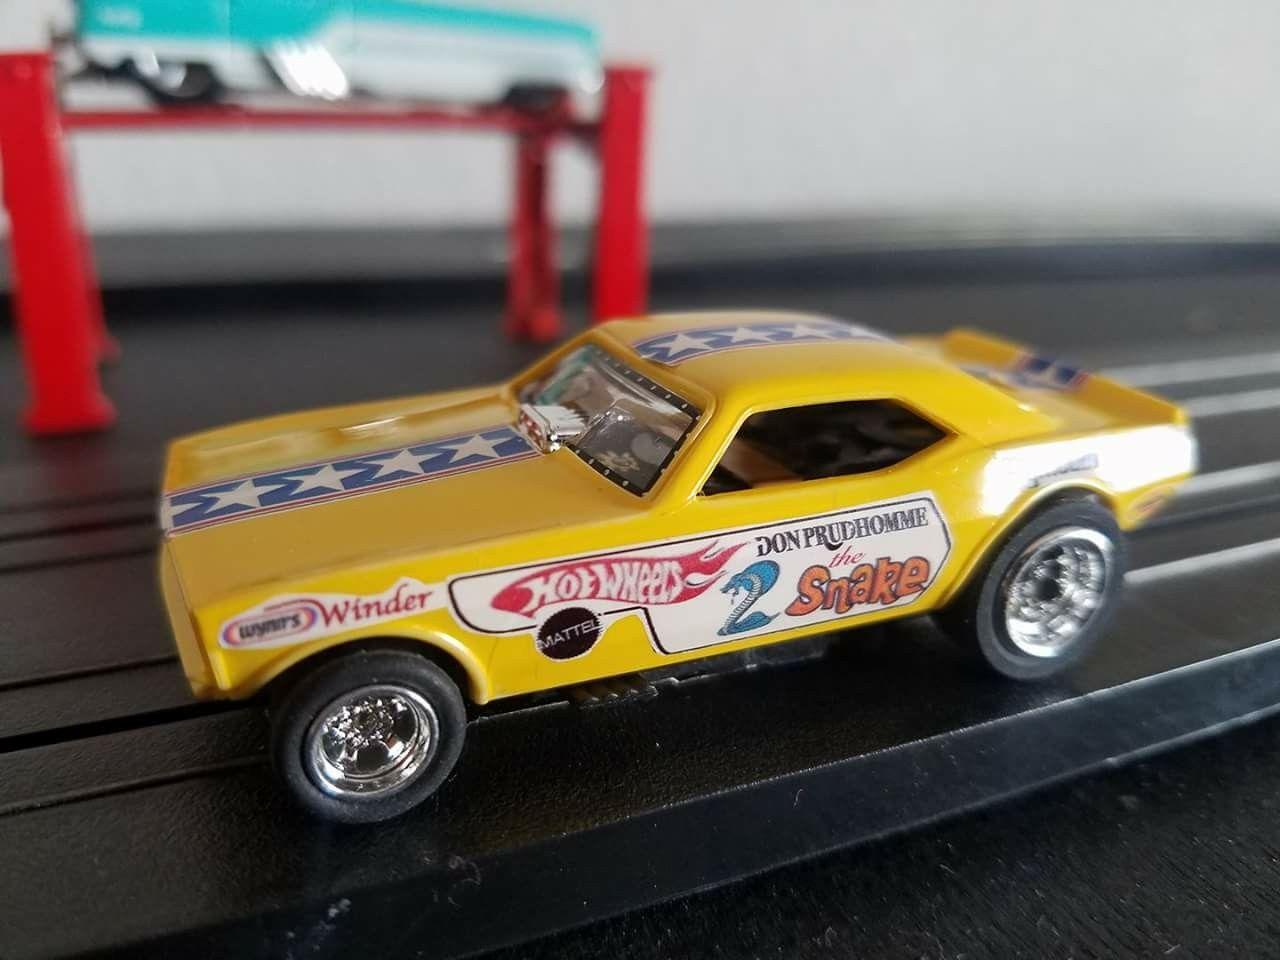 Pin by Ed C on HO Slot Car Drag Racing Slot cars, Model